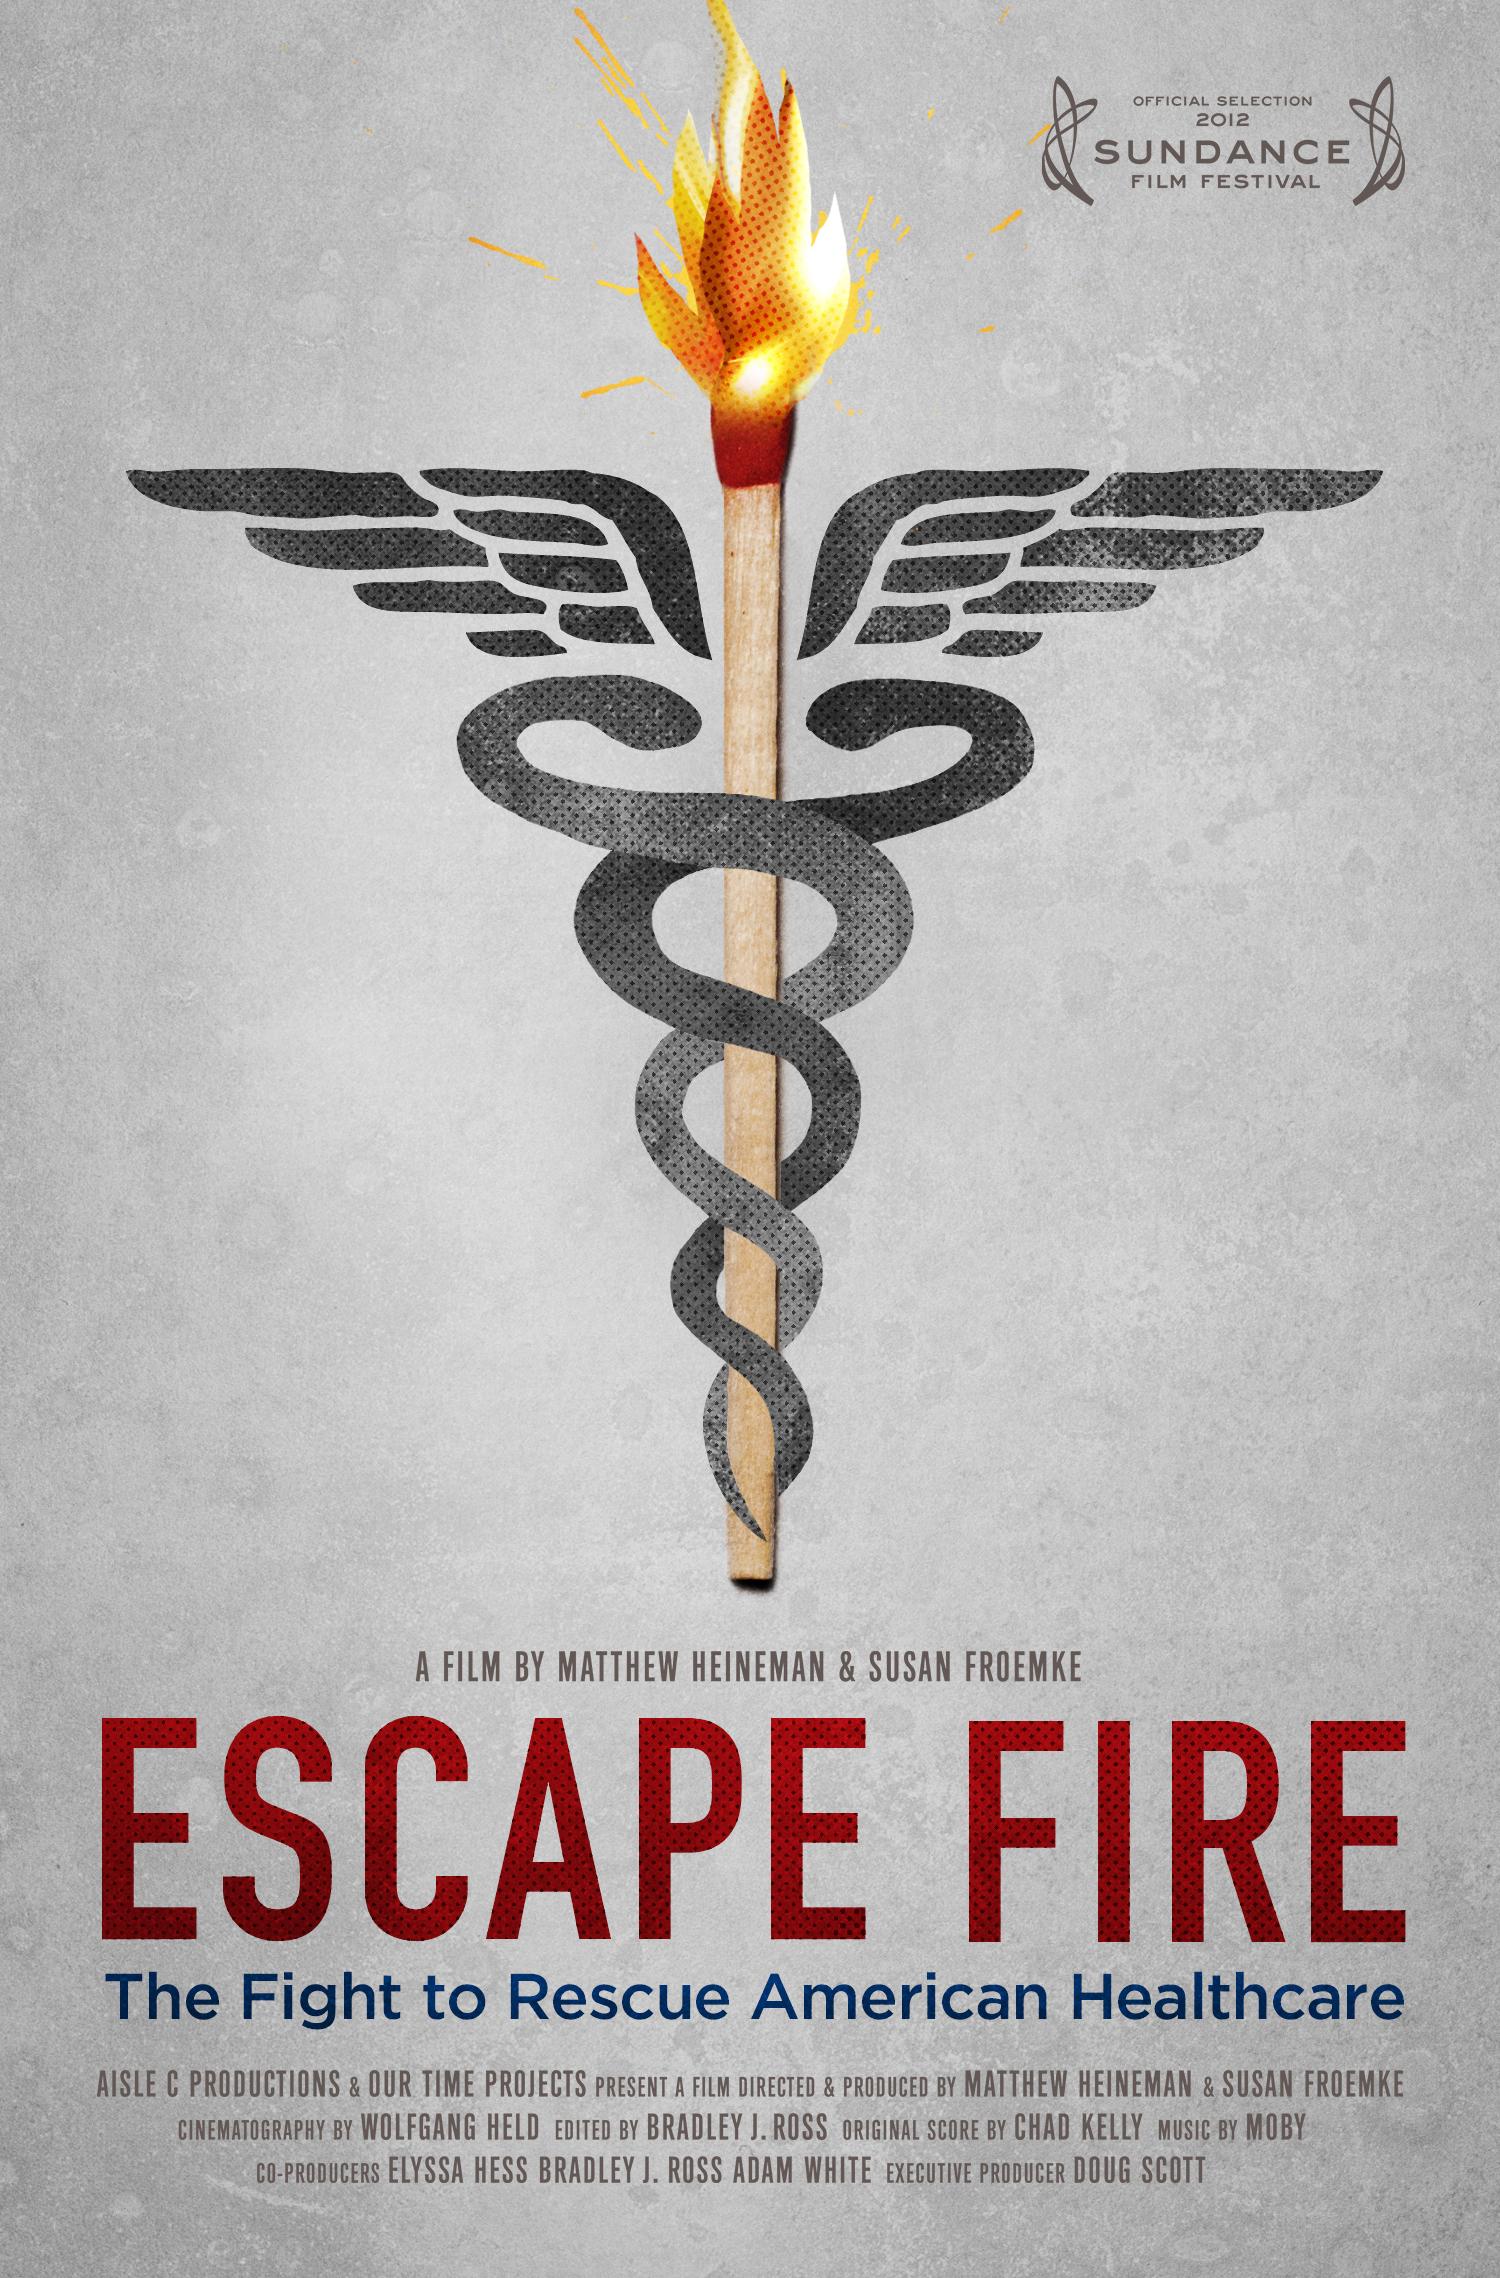 PurposeCo-JayBryant_EscapeFire-01.jpg